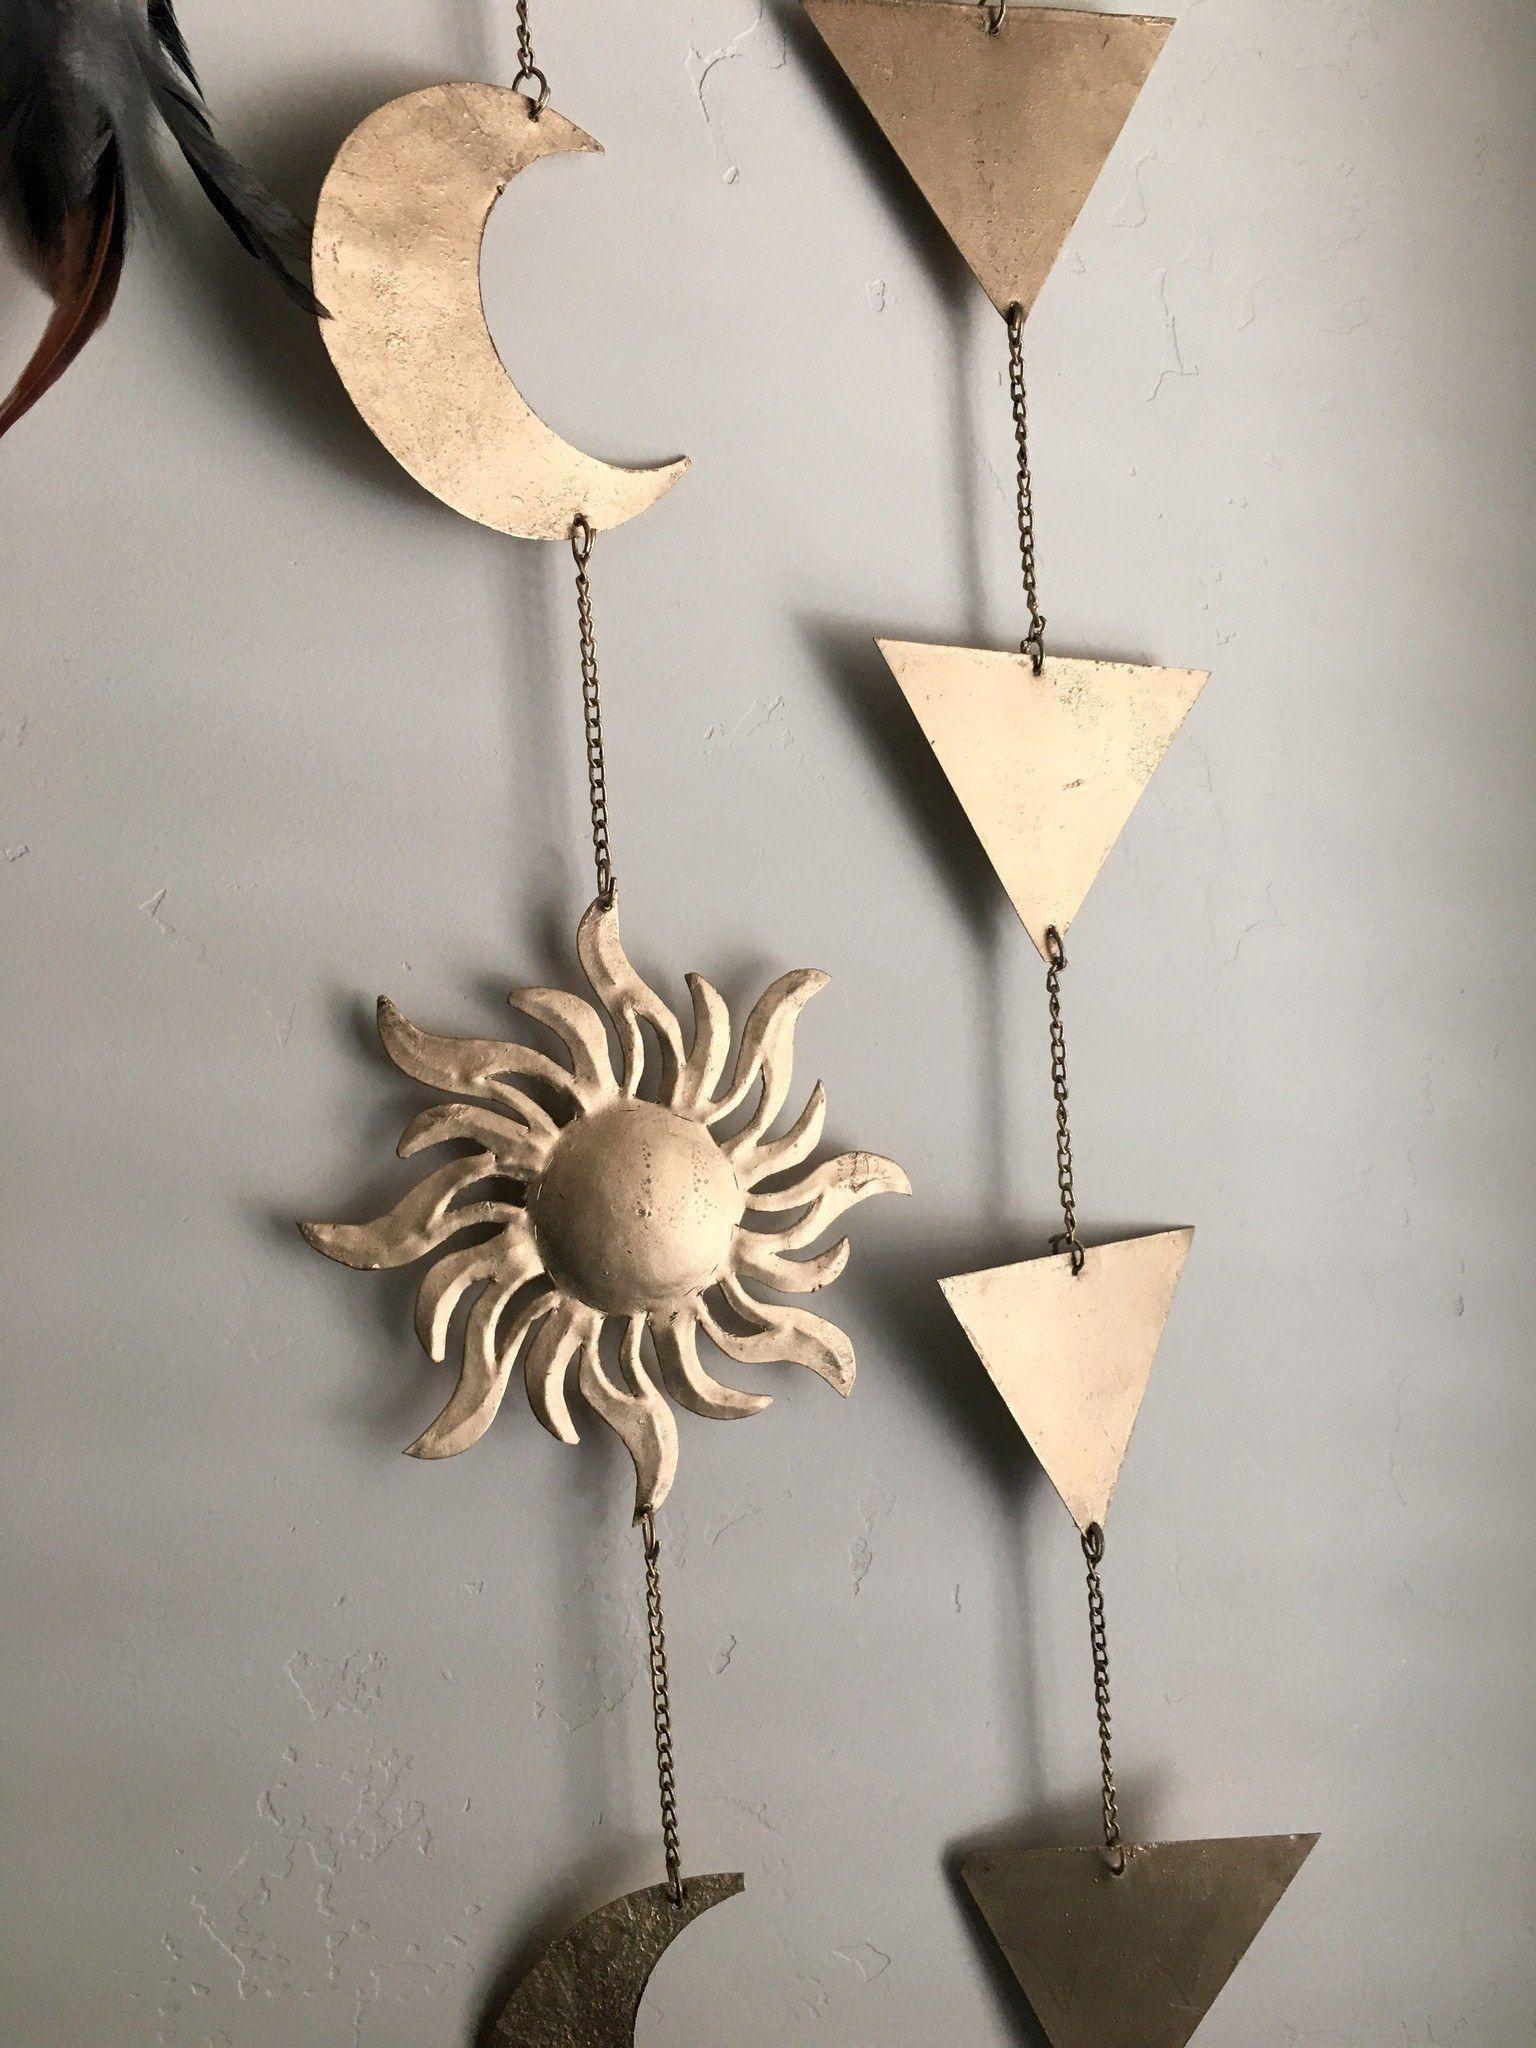 Sun Moon and Stars Wall Hanging Decor | Wall hanging decor, Wall ...